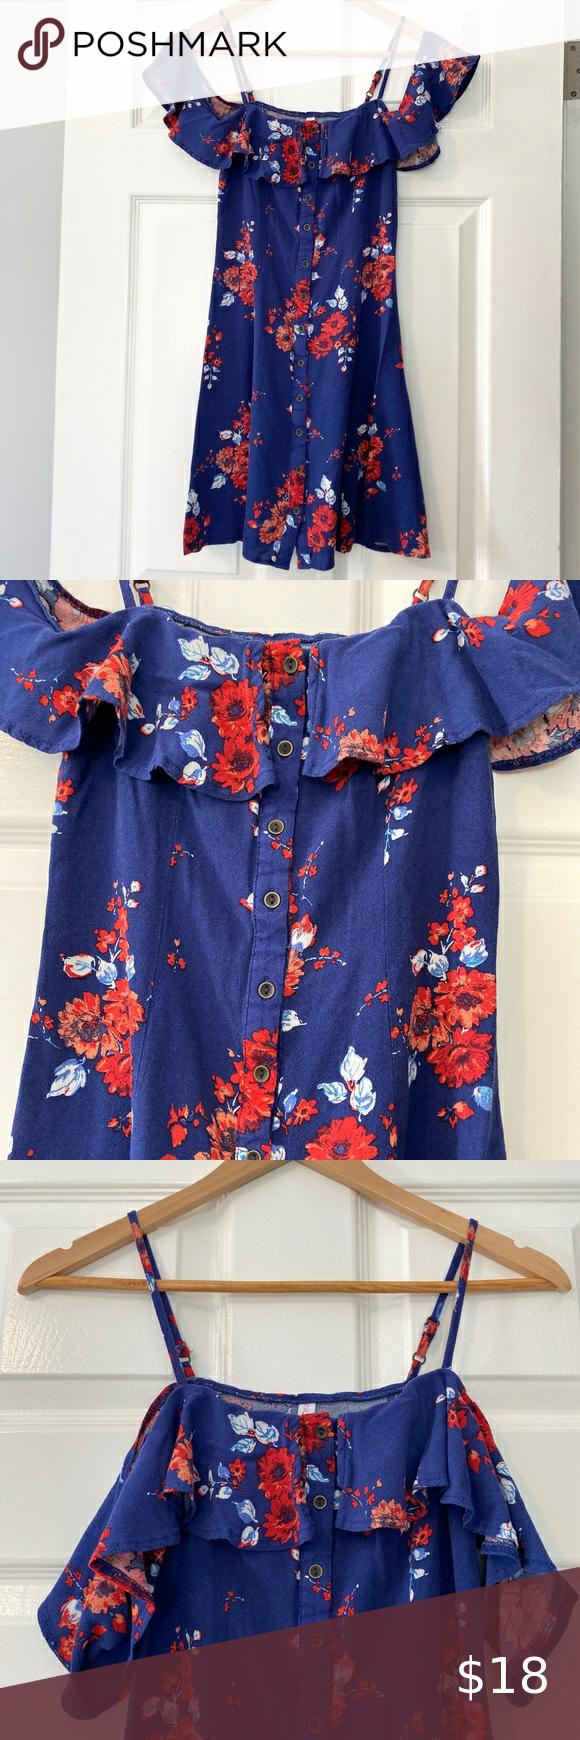 Target Blue Floral Off The Shoulder Button Dress Extra Small Dress Sheer Mini Dress Mini Sweater Dress [ 1740 x 580 Pixel ]